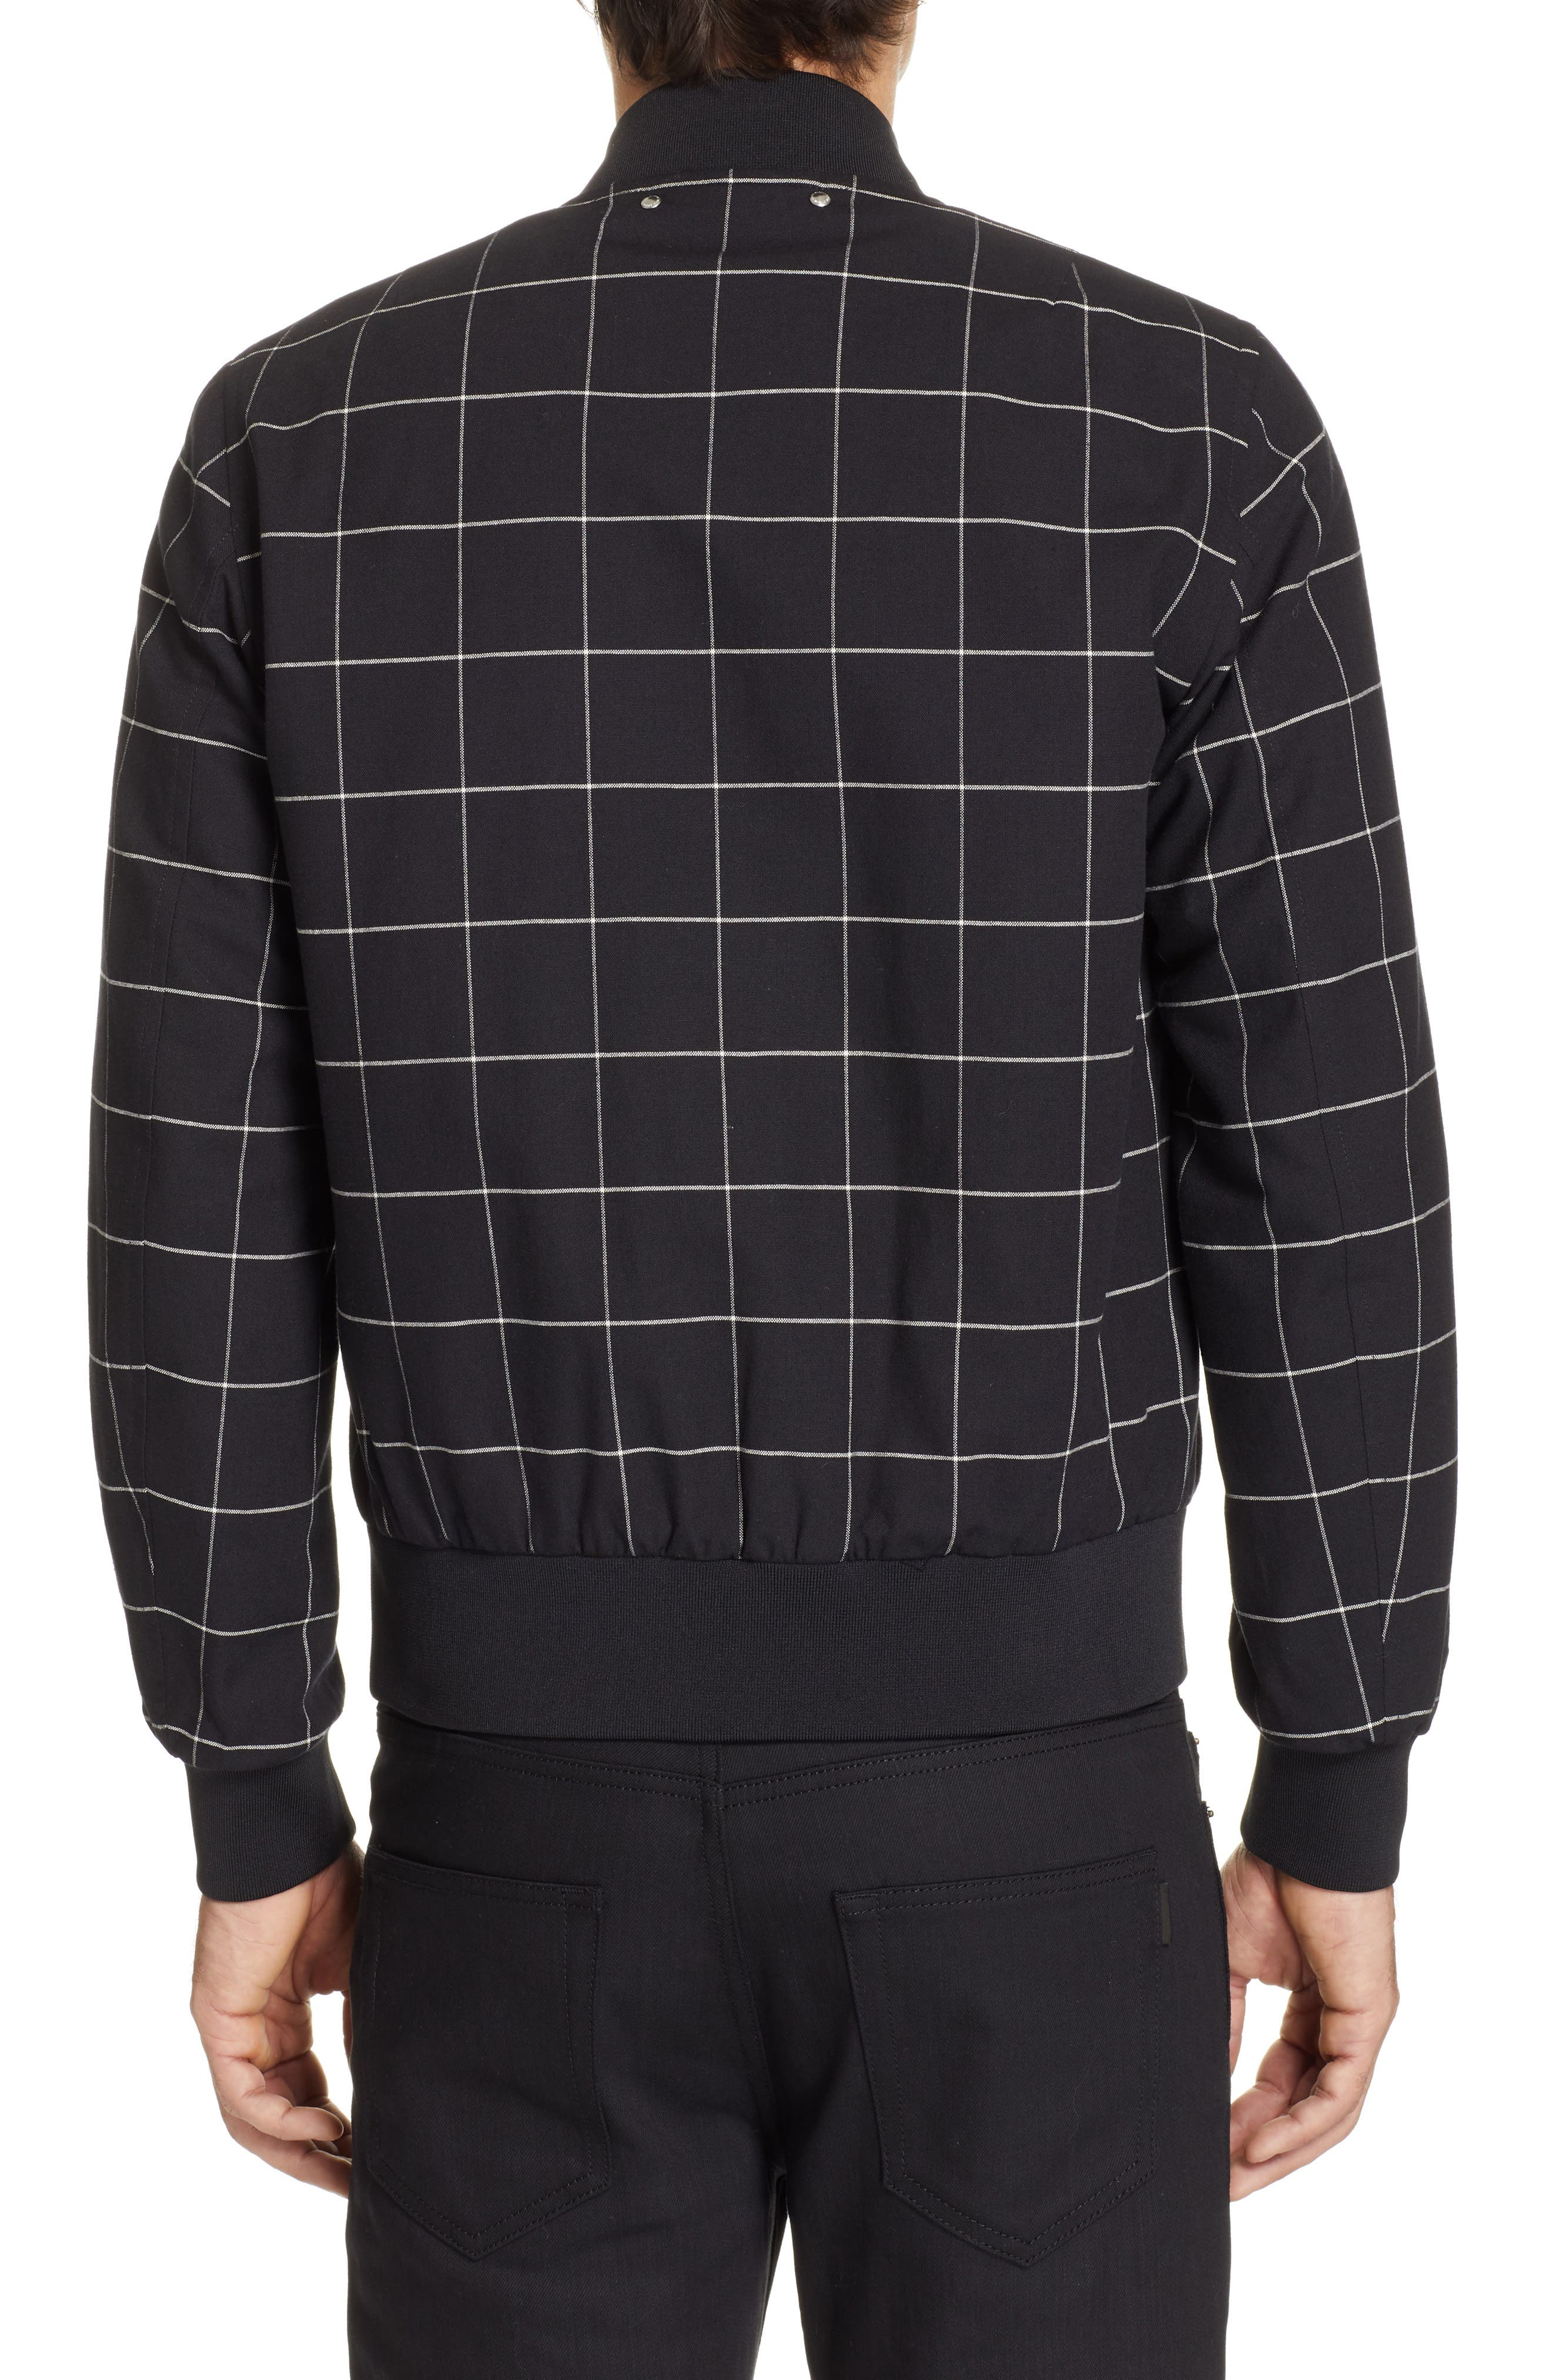 PS PAUL SMITH, Grid Wool Blend Bomber Jacket, Alternate thumbnail 2, color, BLACK